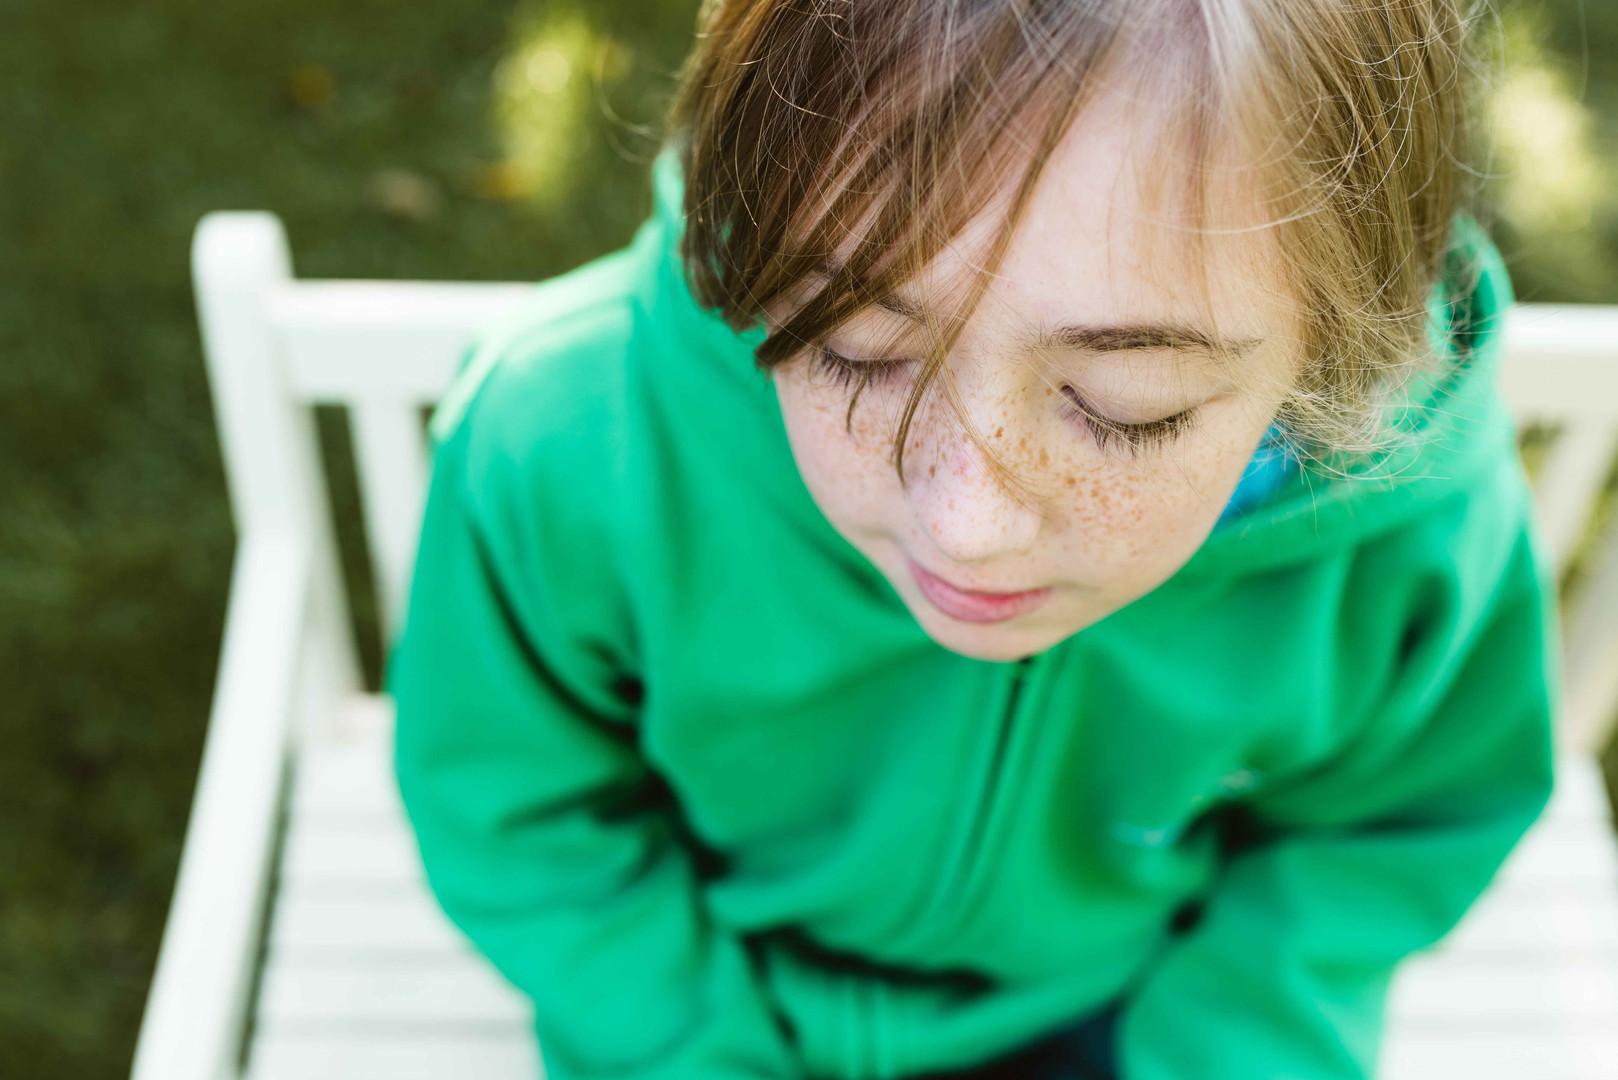 Girl sitting in the garden